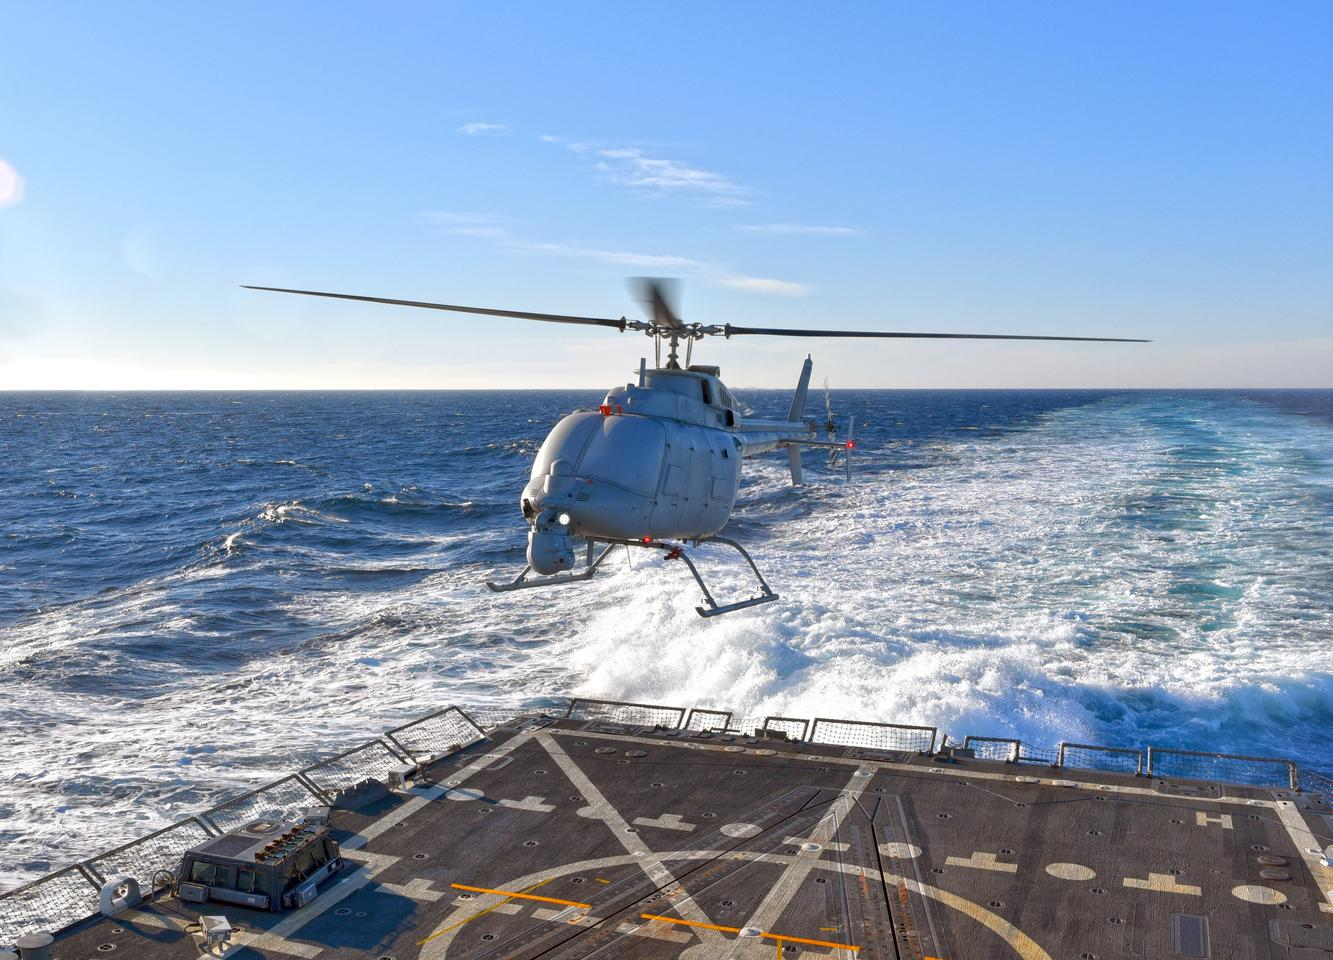 The MQ-8C Fire Scout hovering over the flight deck of USS Jason Dunham (Photo: Northrop Grumman)